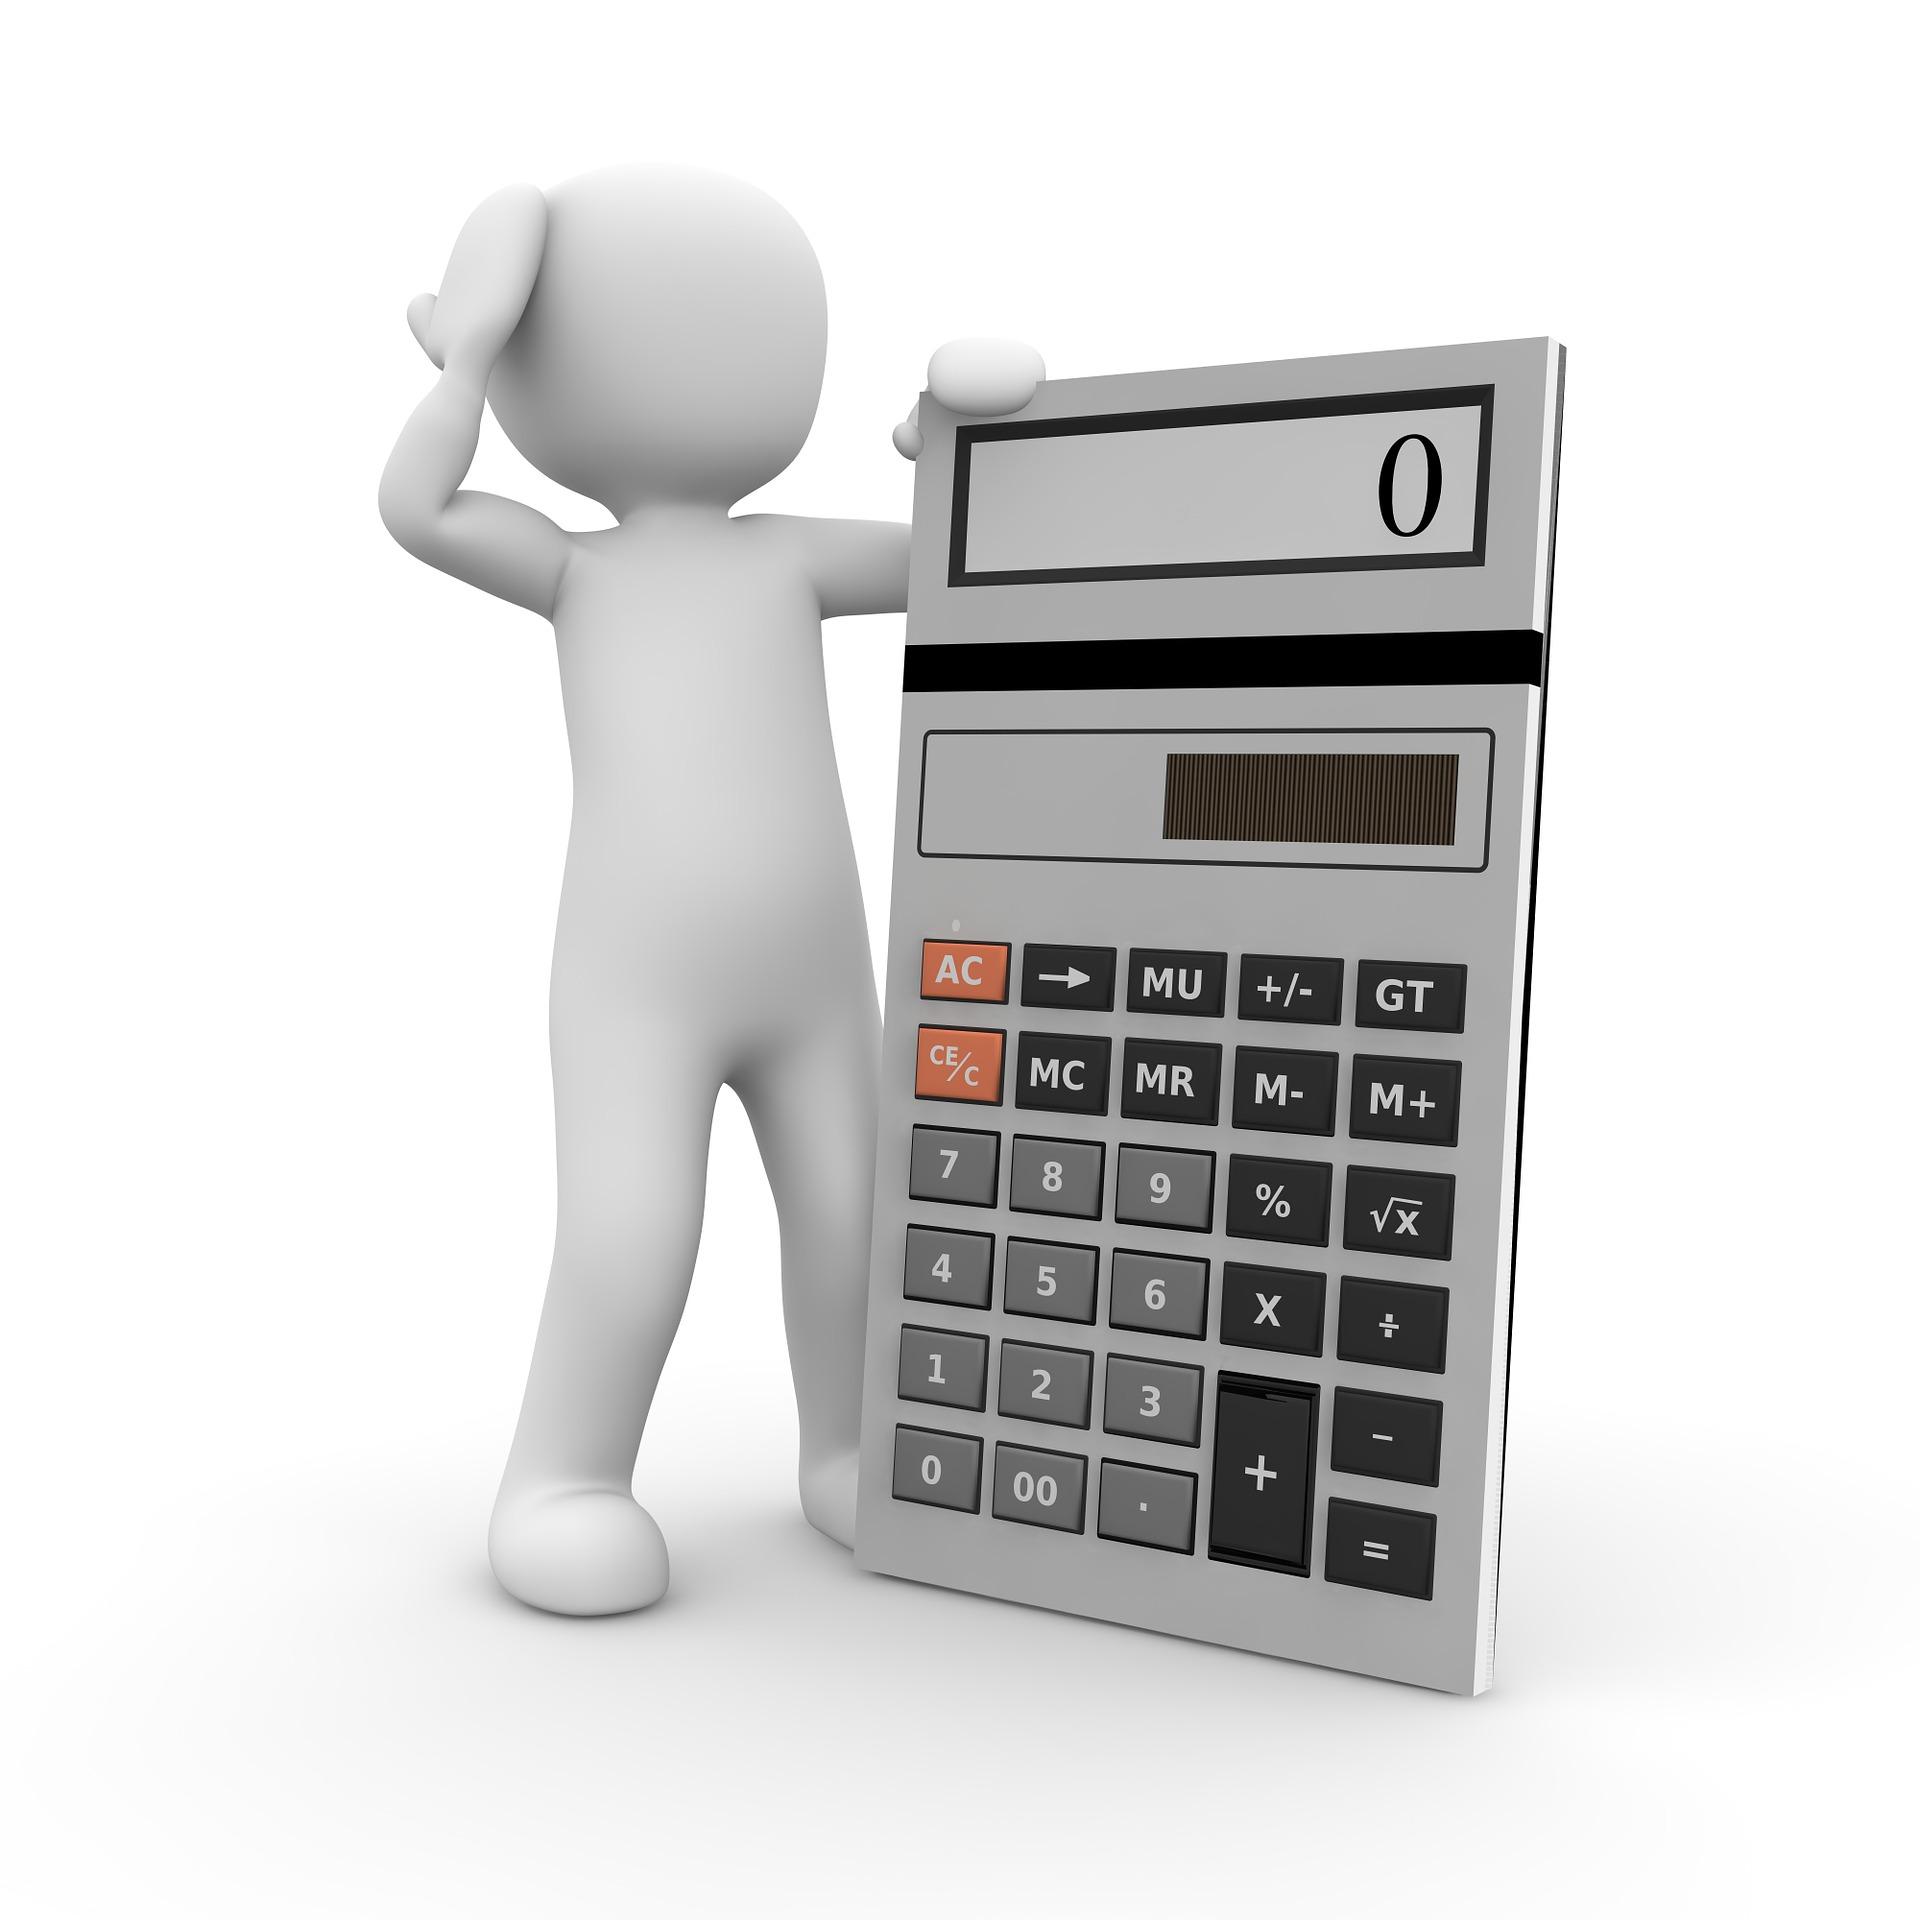 tarieven vergoeding dietist